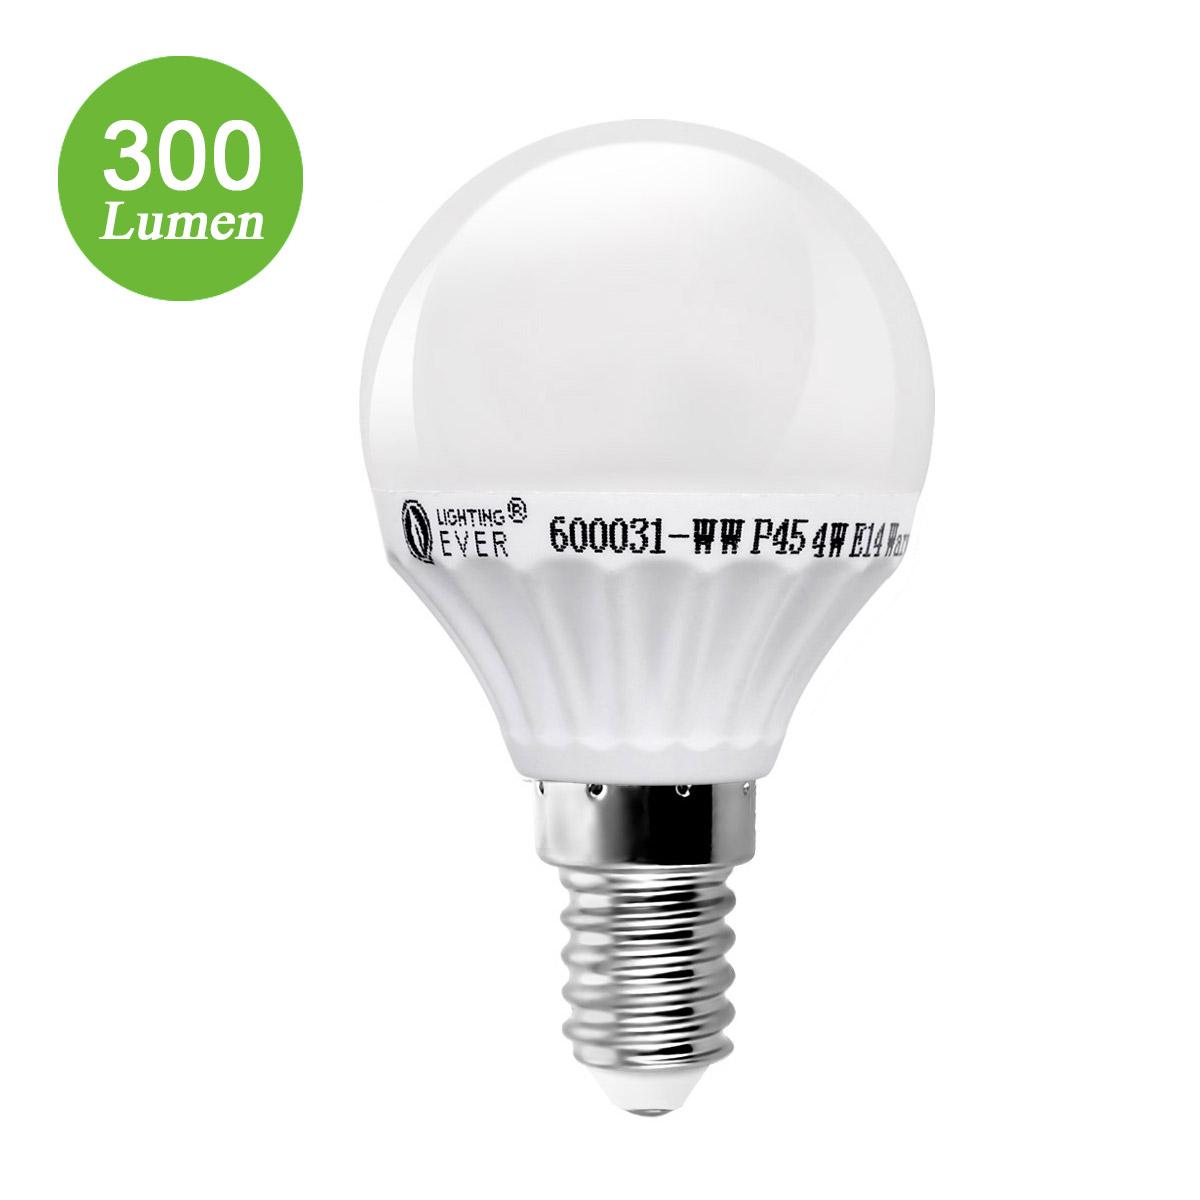 4W E14 P45 LED Birnen, 300lm Golfball Lampen, ersetzt 35W Glühlampe, Warmweiß